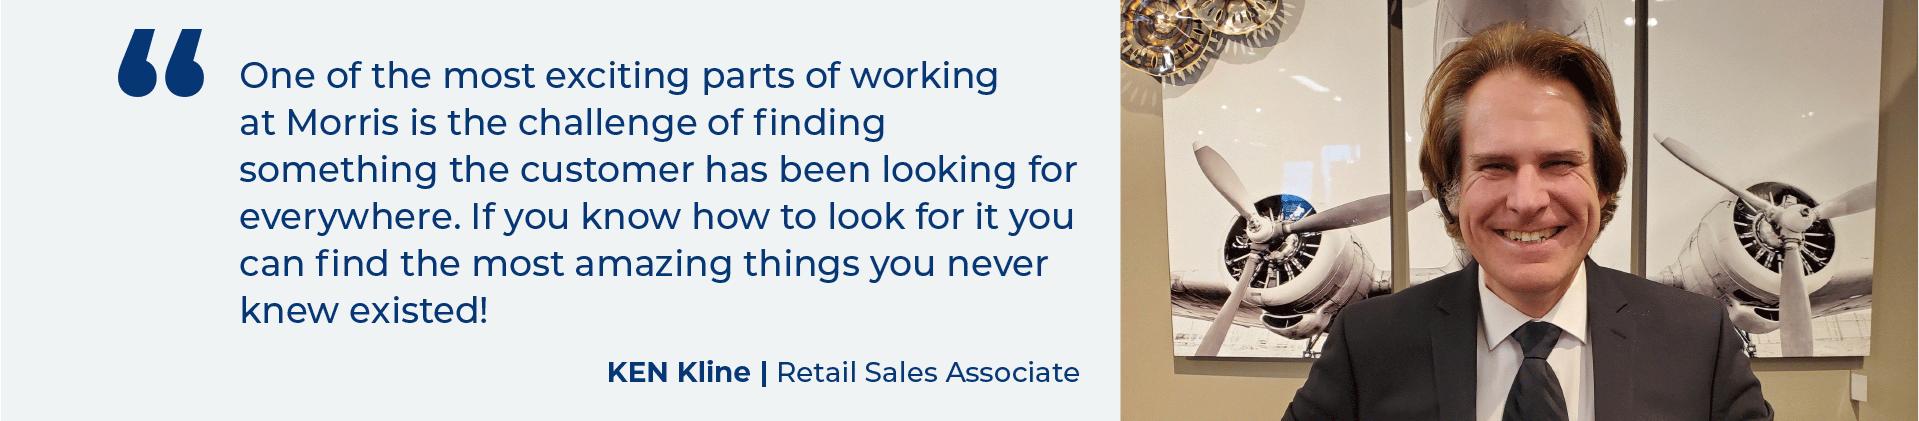 Retail Careers Testimonial Desktop